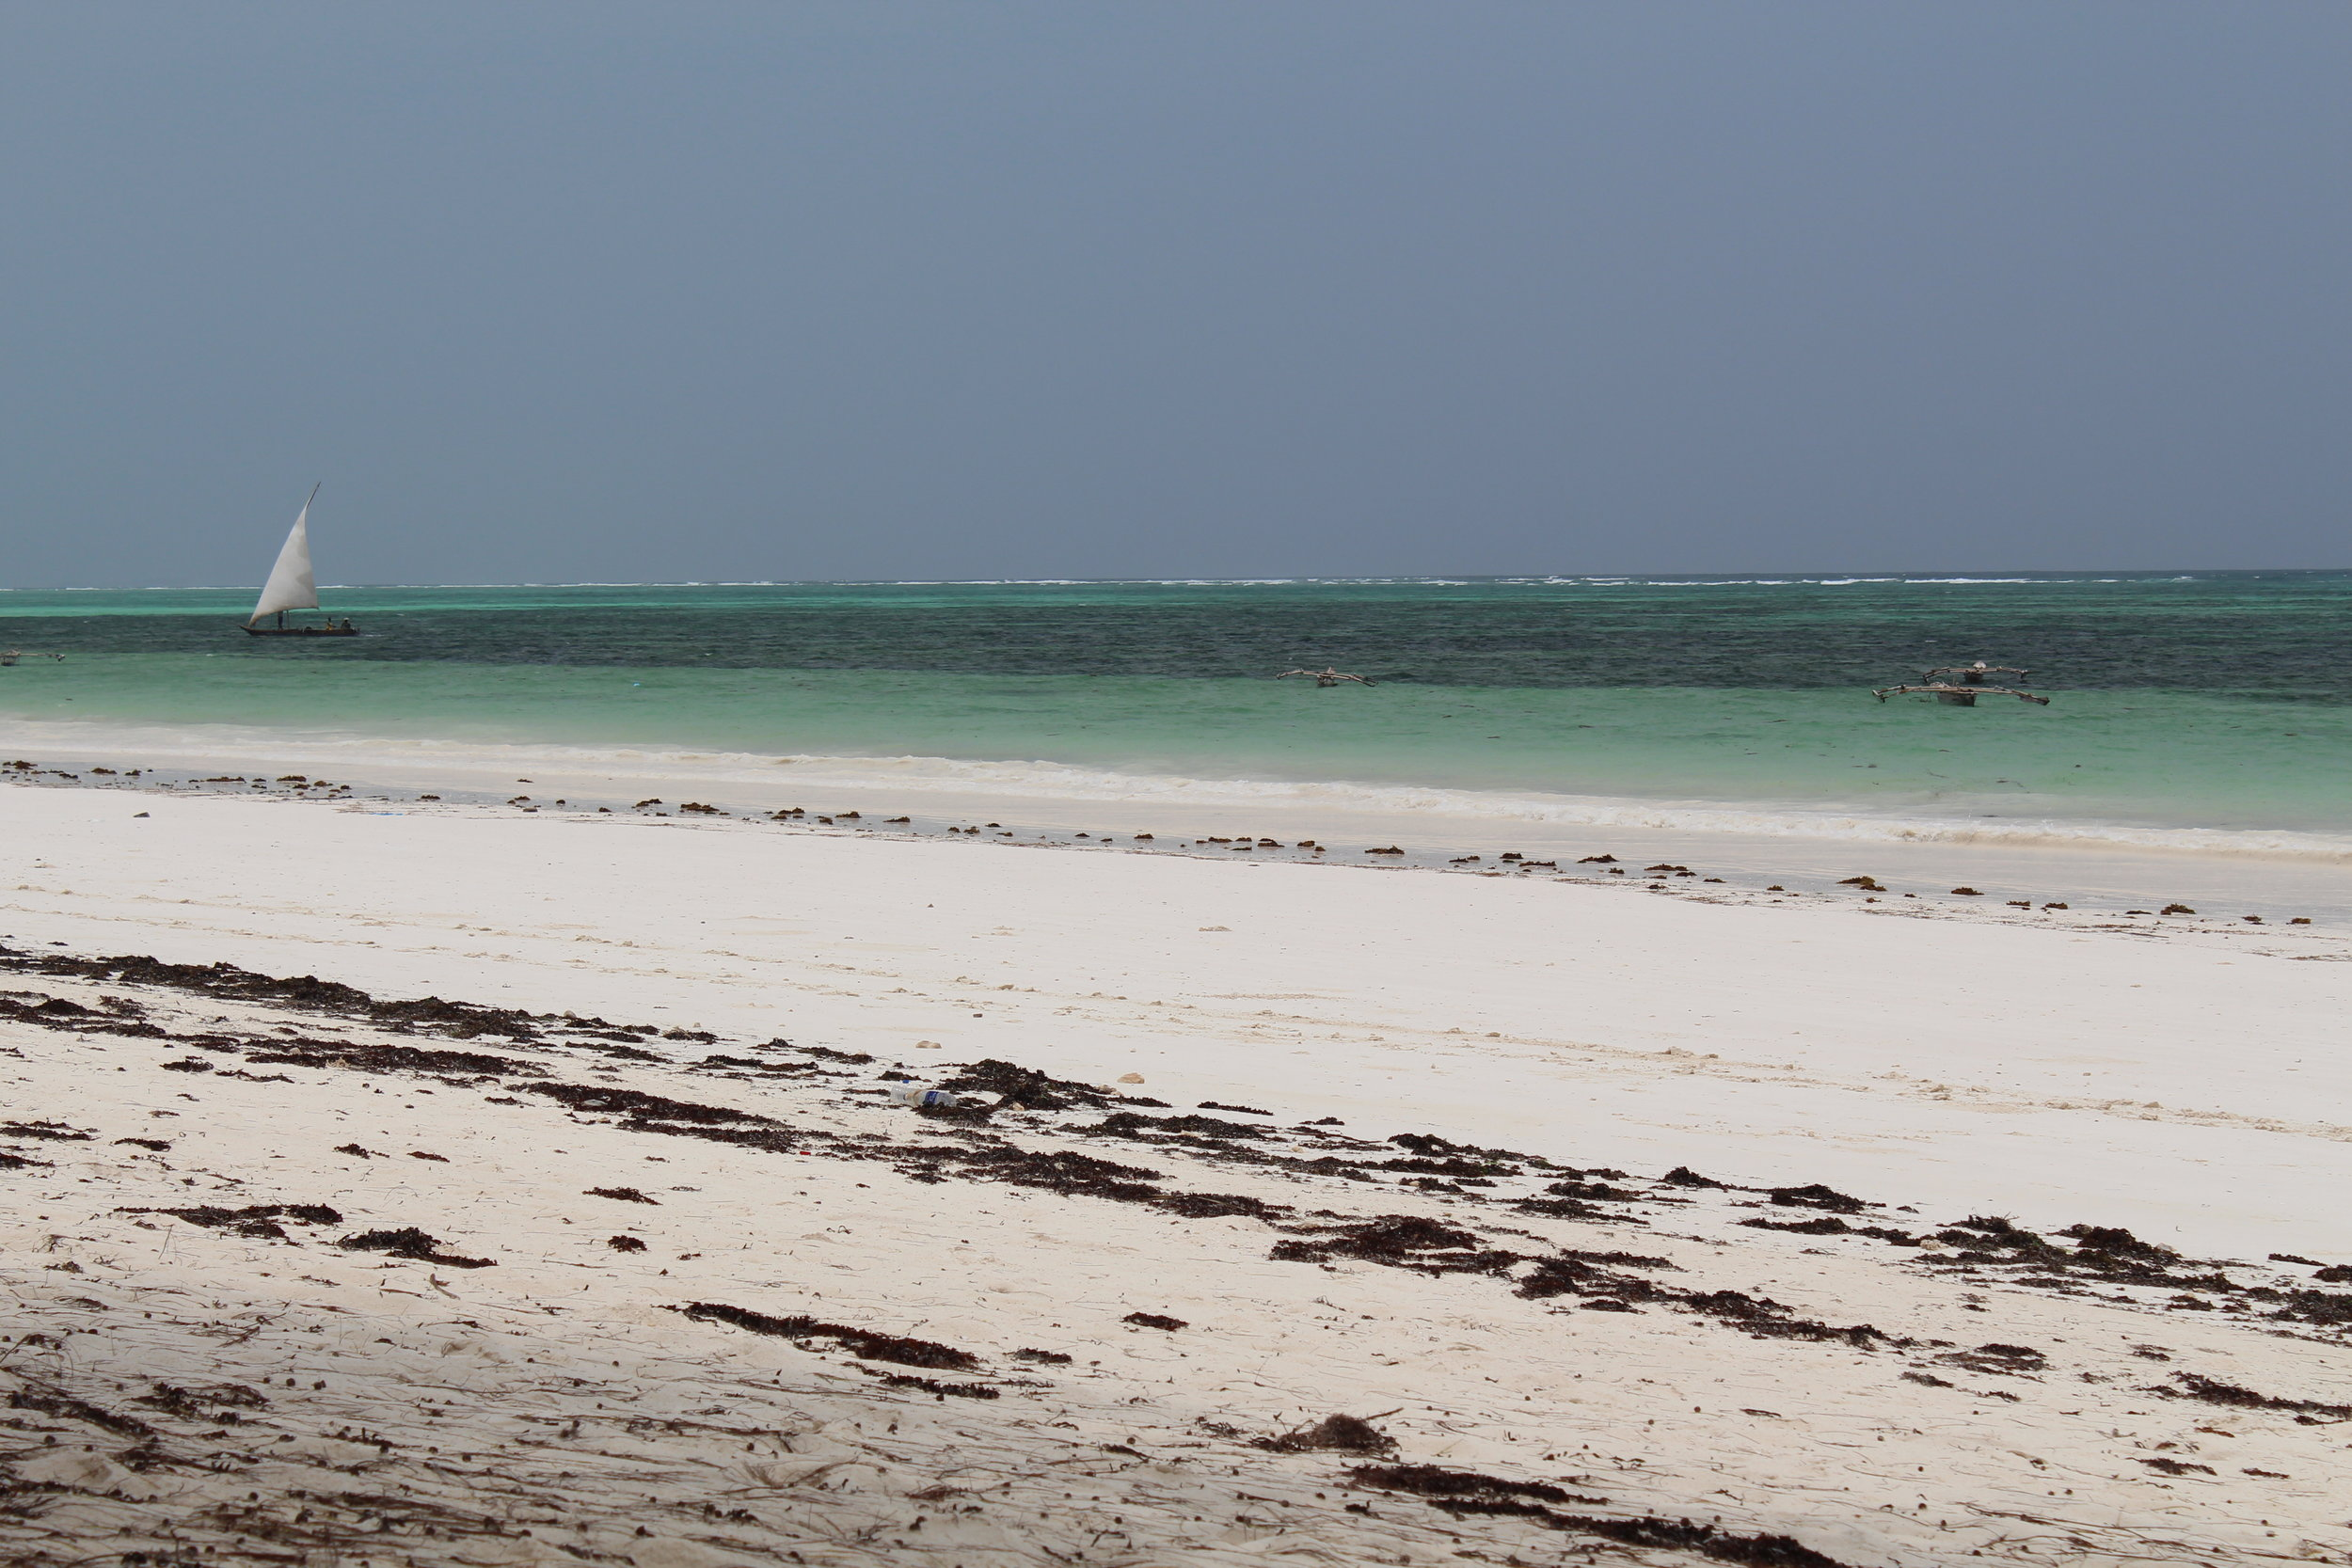 Beach at Kiwengwa, Zanzibar